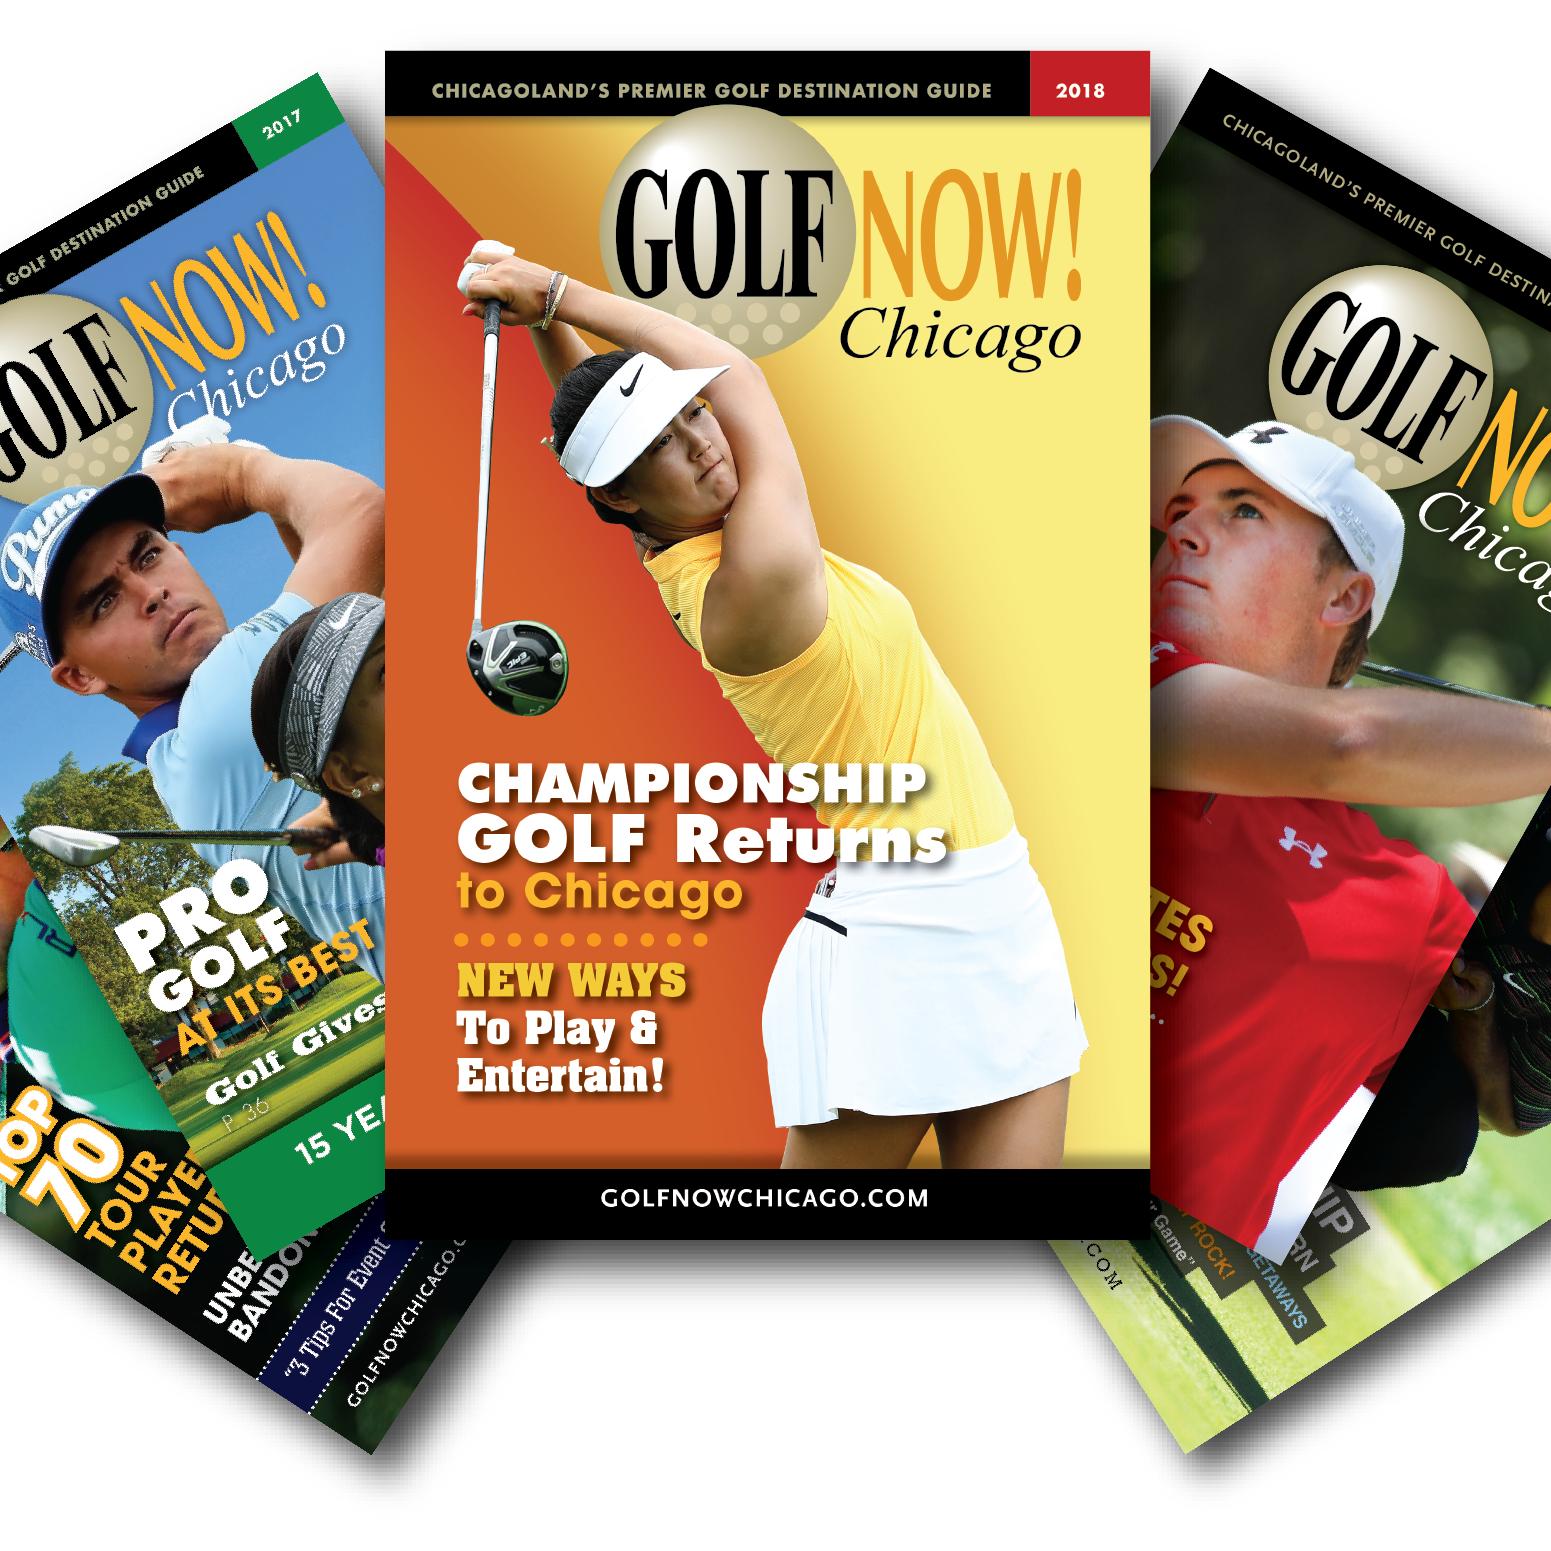 Golfnow coupon code